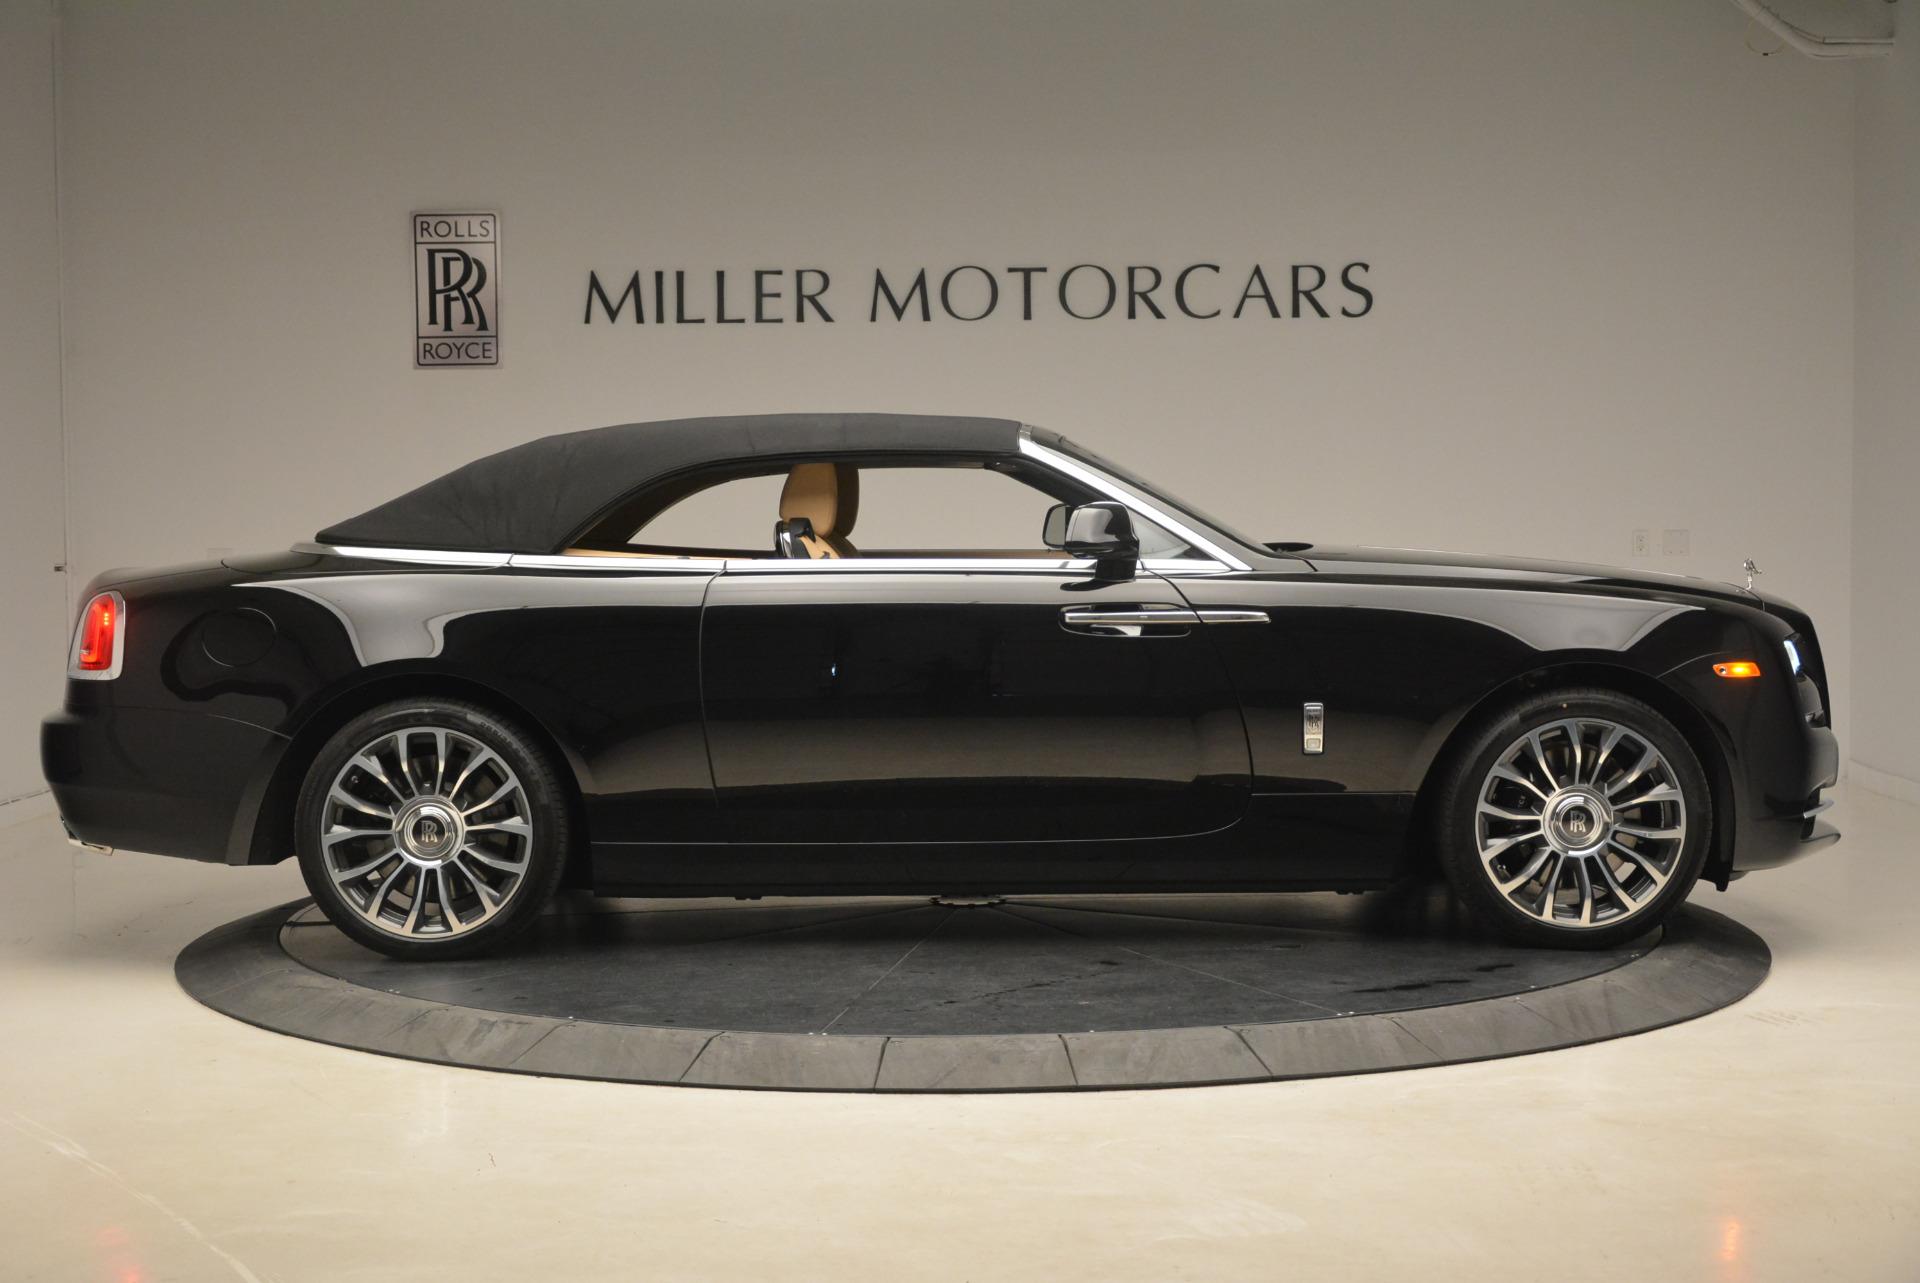 Used 2018 Rolls-Royce Dawn  For Sale In Greenwich, CT. Alfa Romeo of Greenwich, R461 2105_p17